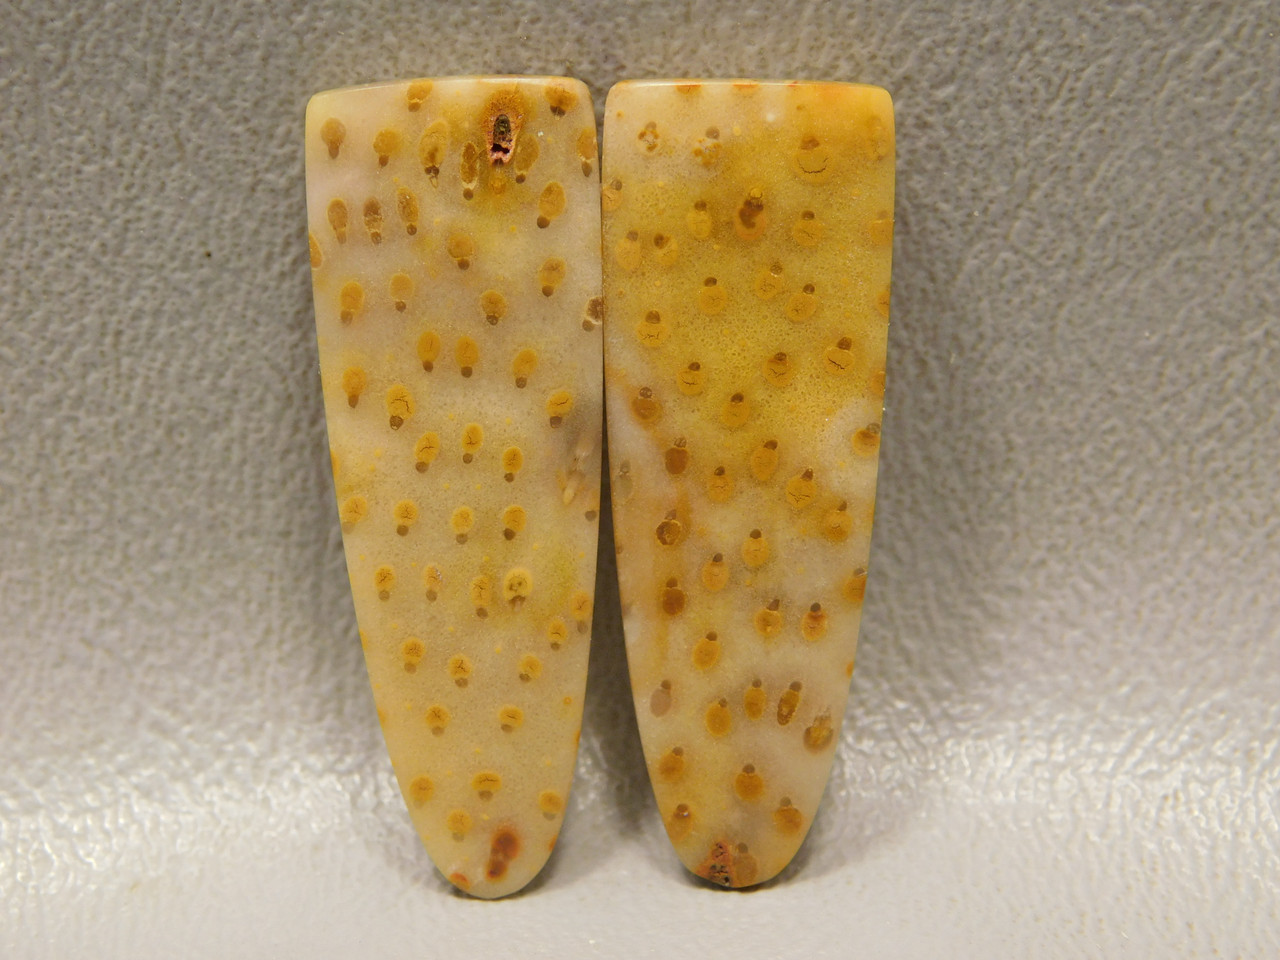 Fossilized Wood Louisiana Palm Tongues Stones Cabochons #24